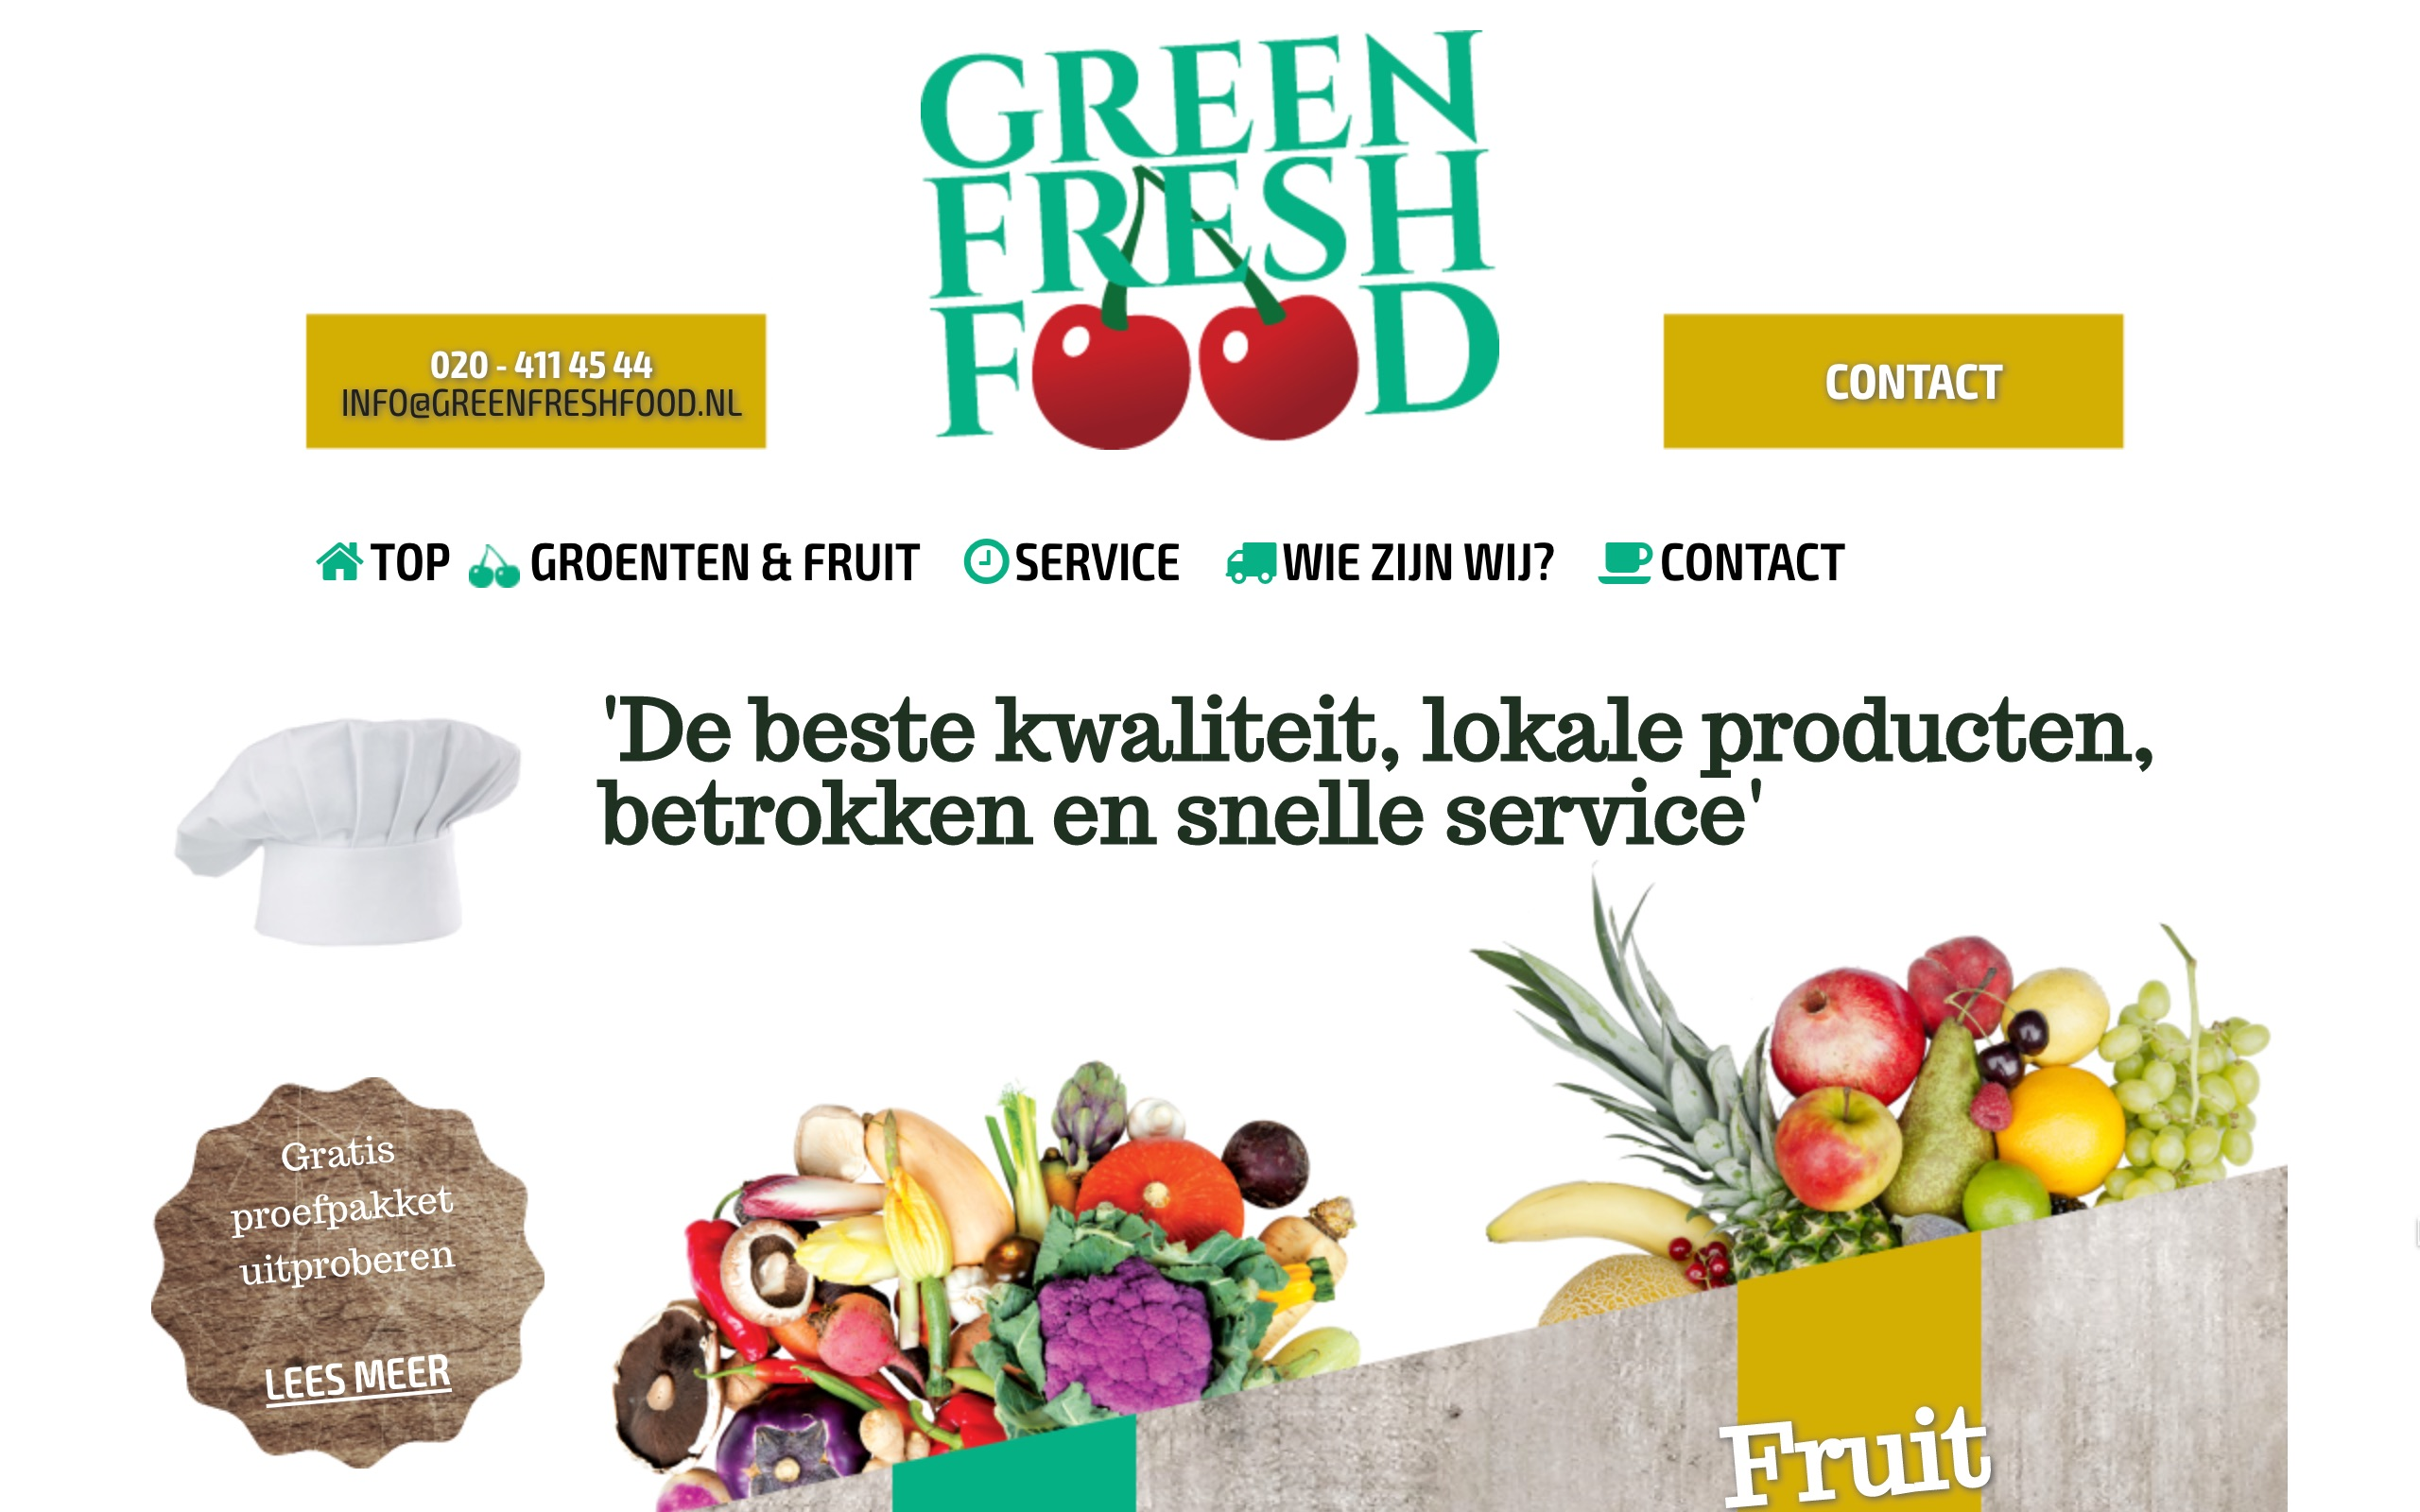 Green Fresh Food